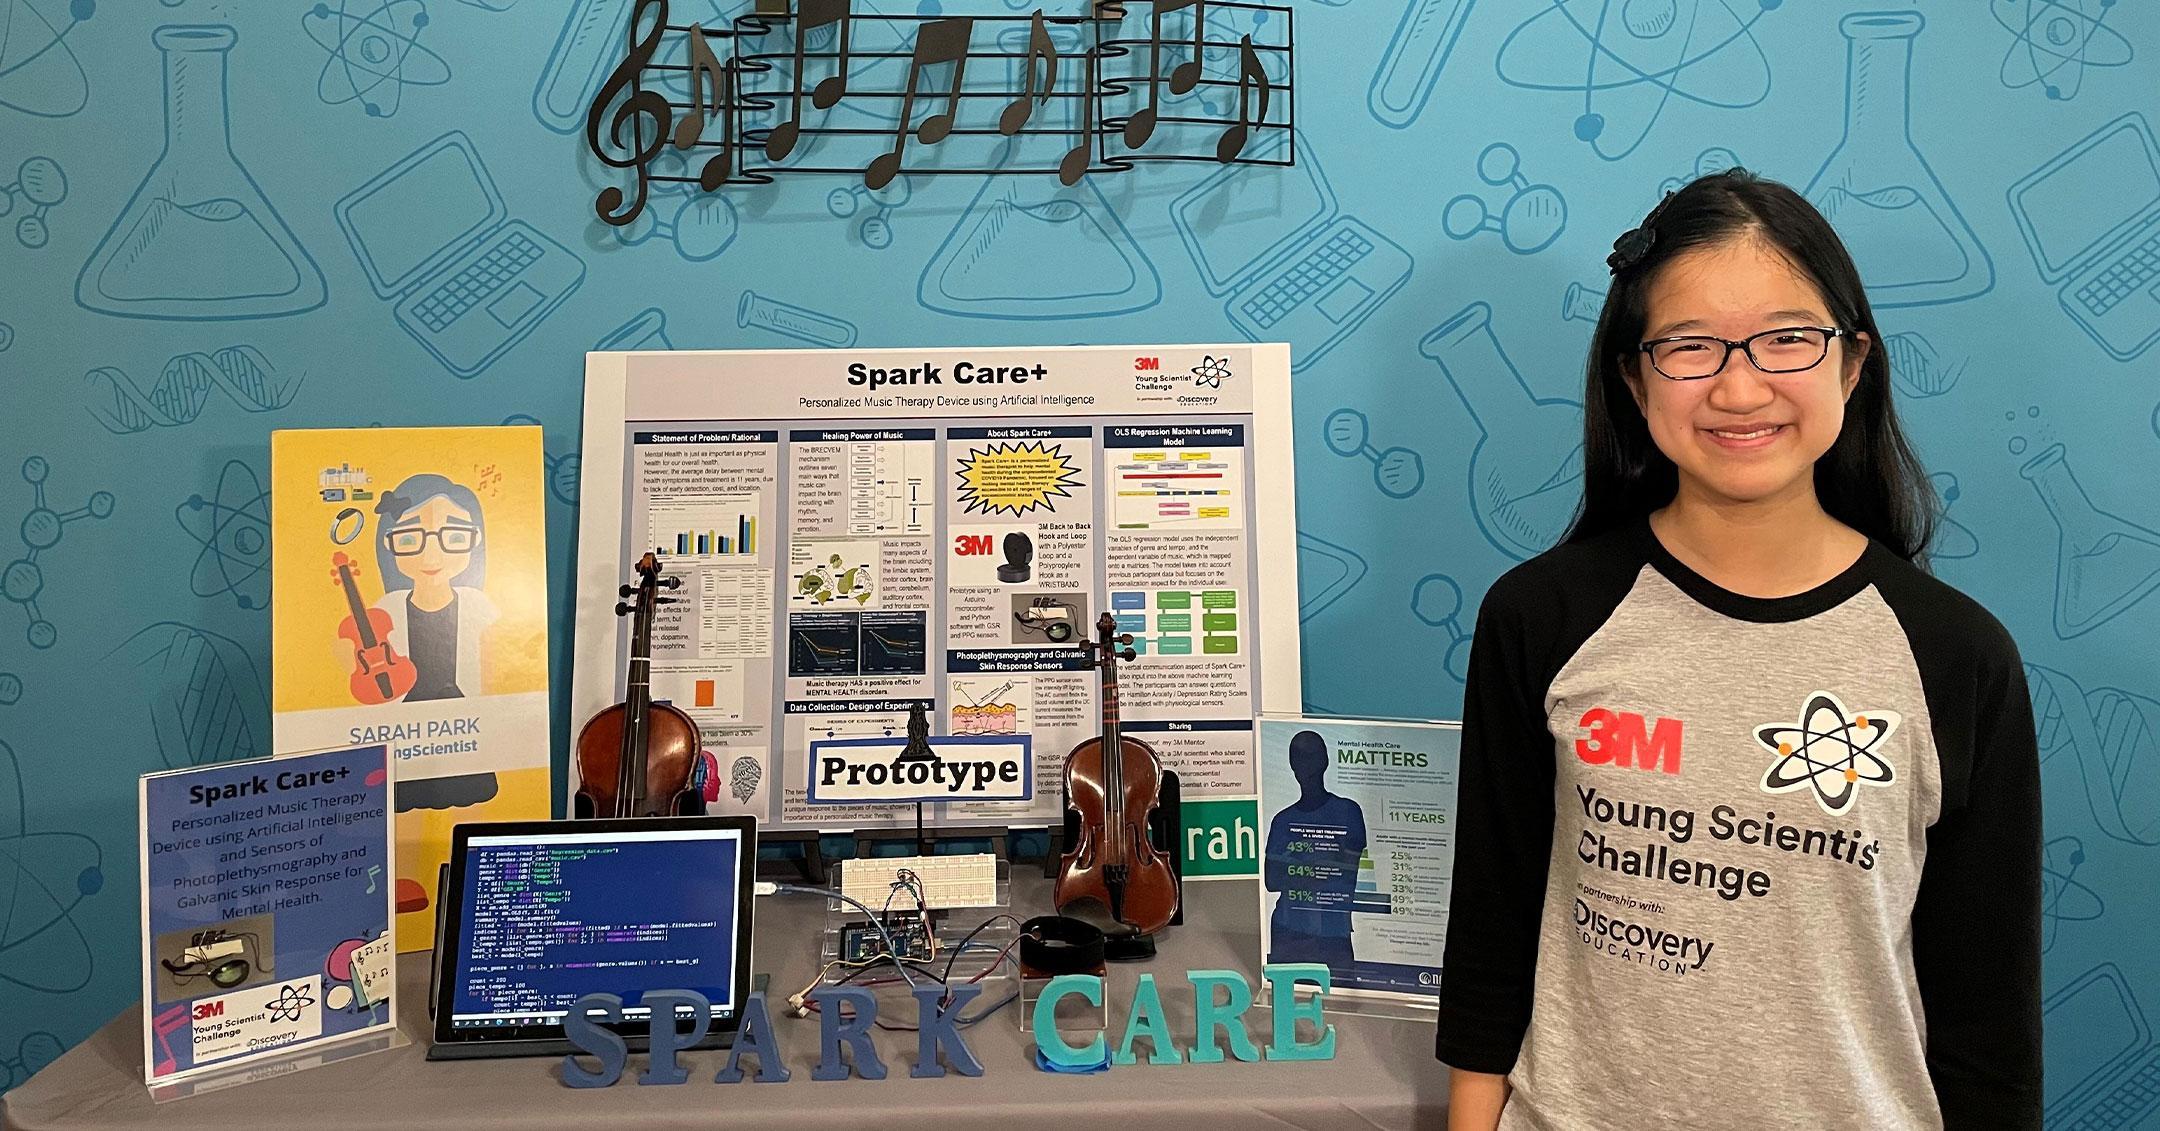 young scientist challenge winner sarah park innovation sparkcare help people mental health pp